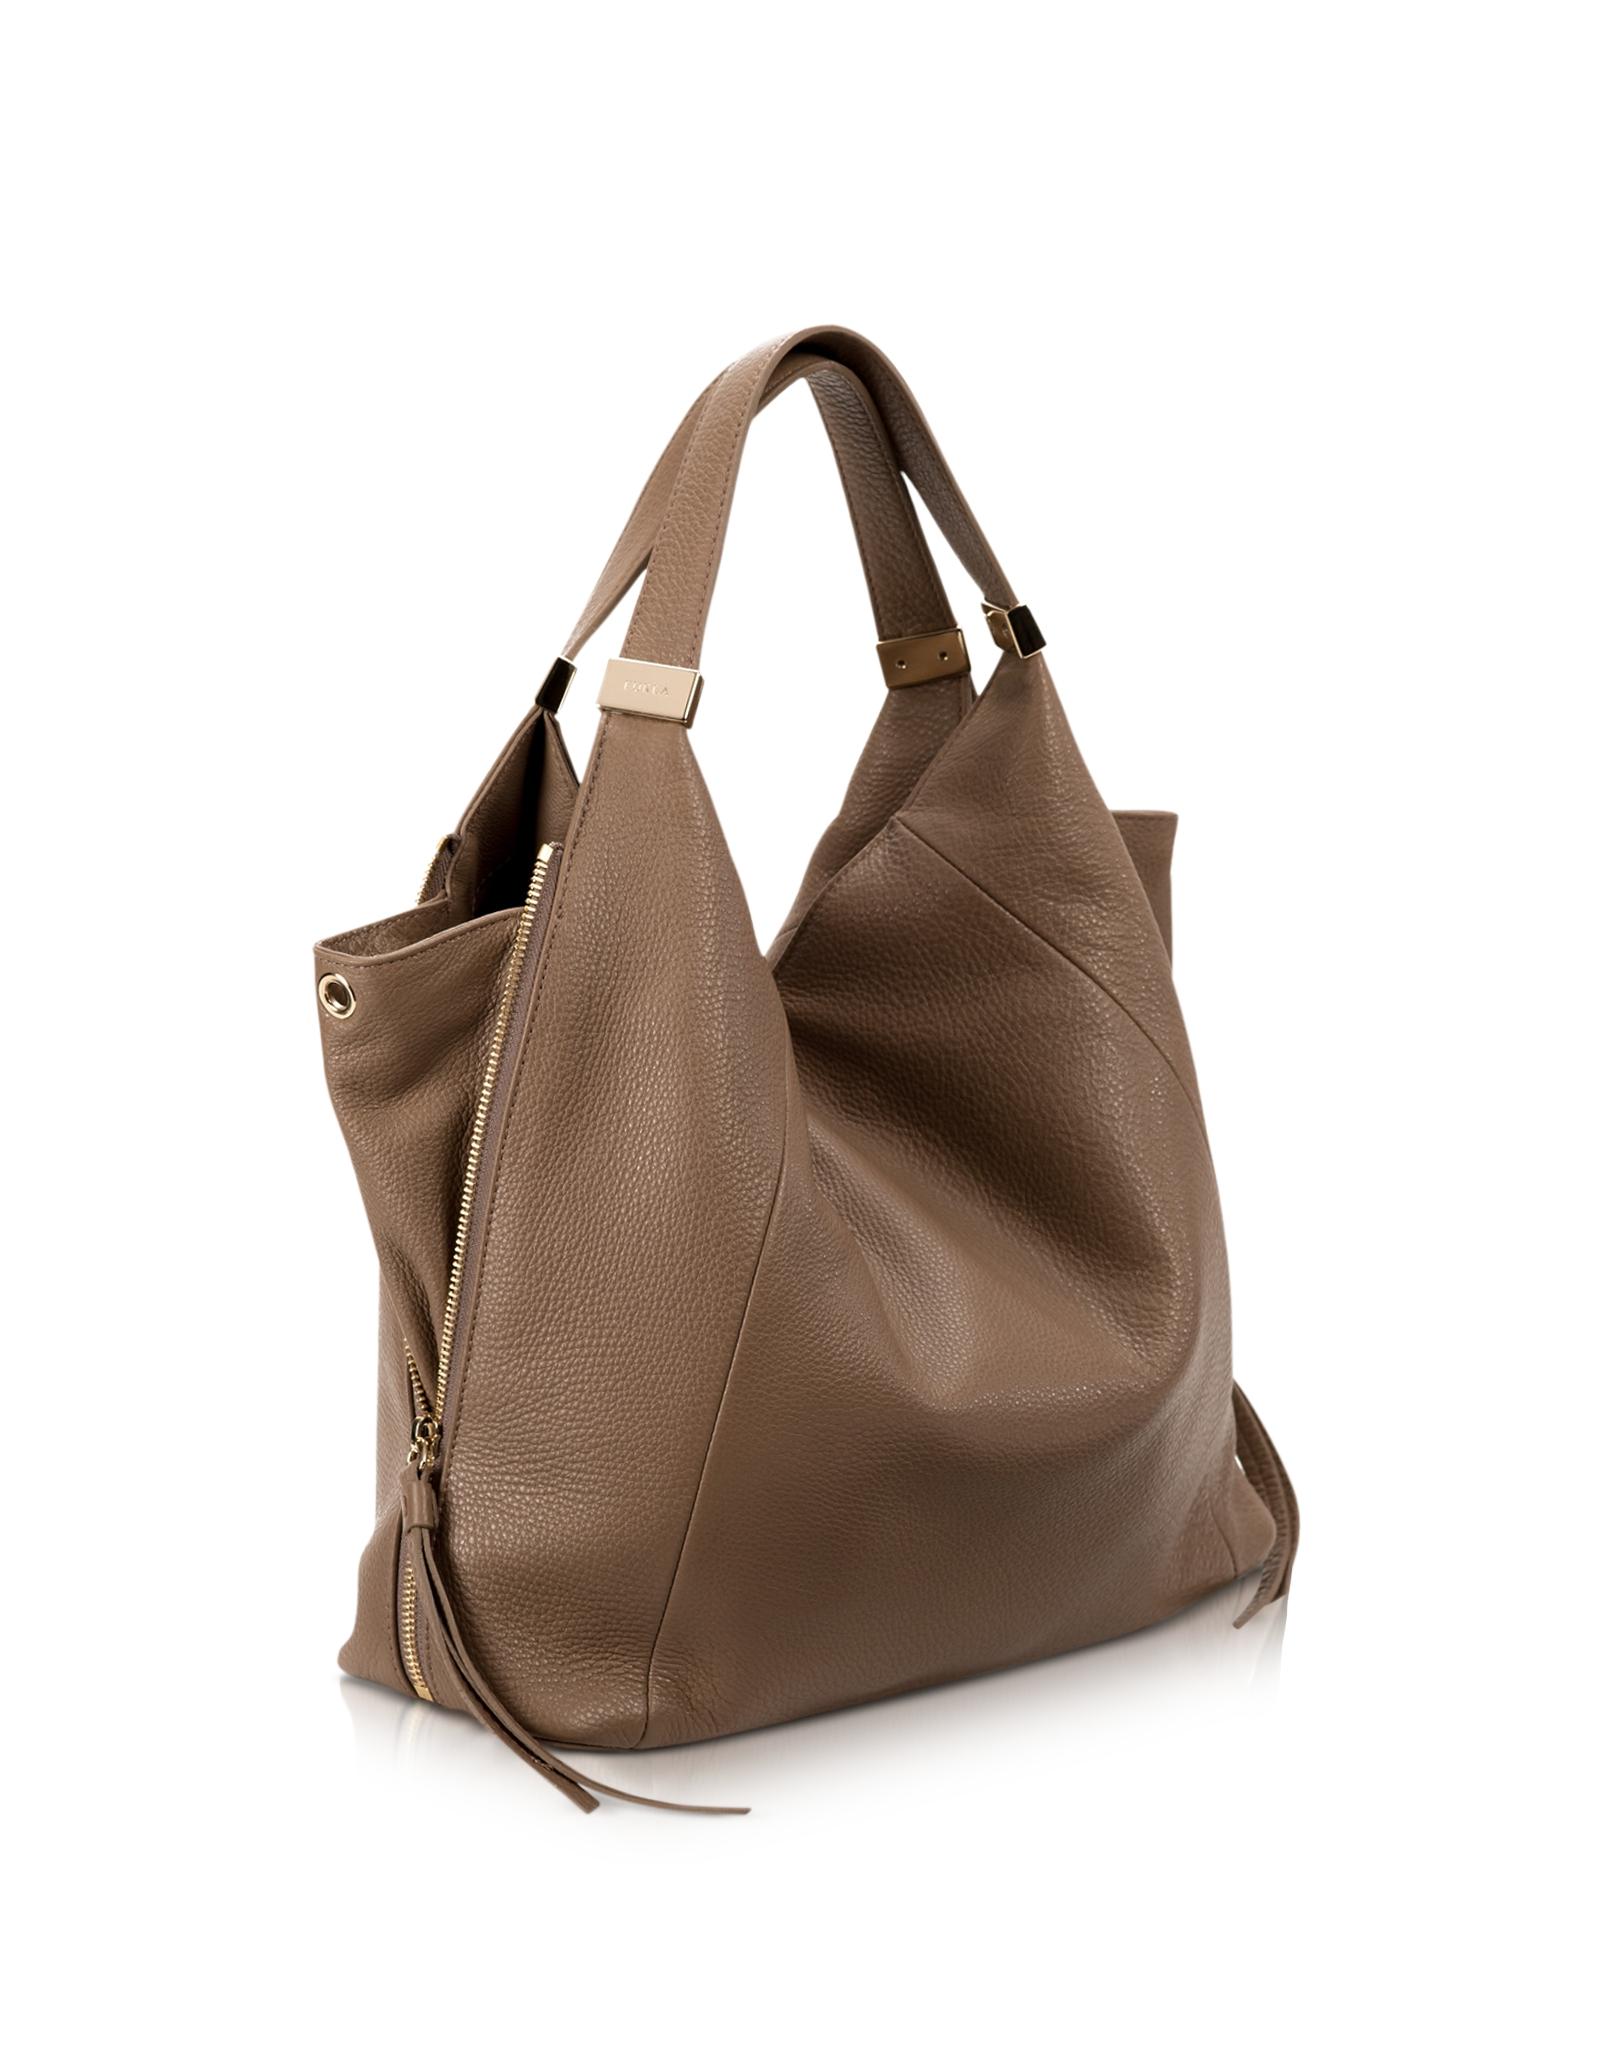 Furla Liz Daino Leather Hobo Bag in Brown